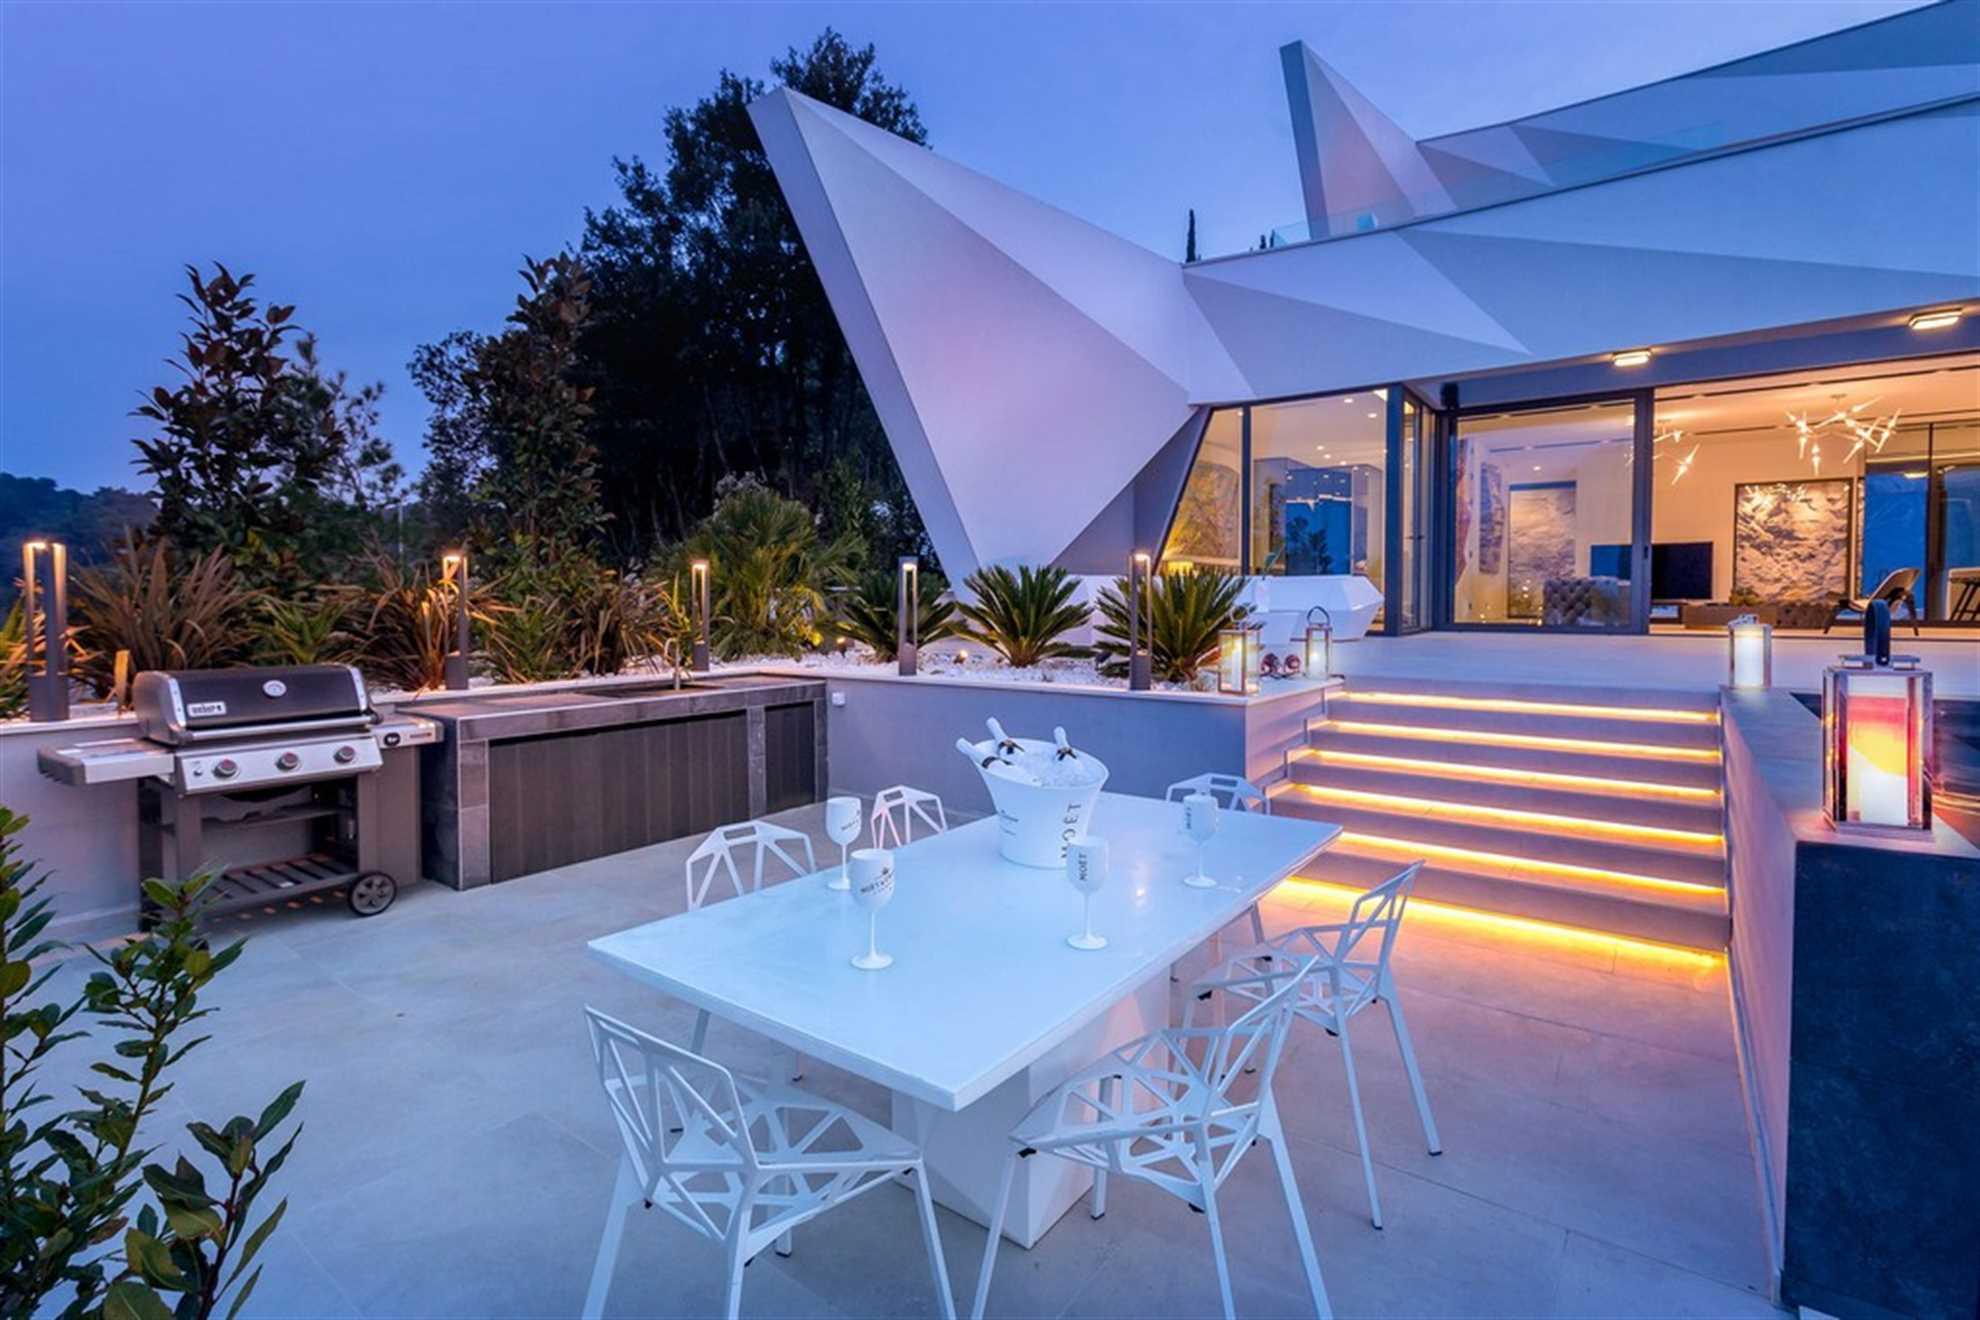 Ljetna terasa ispred vile Korcula Diamond